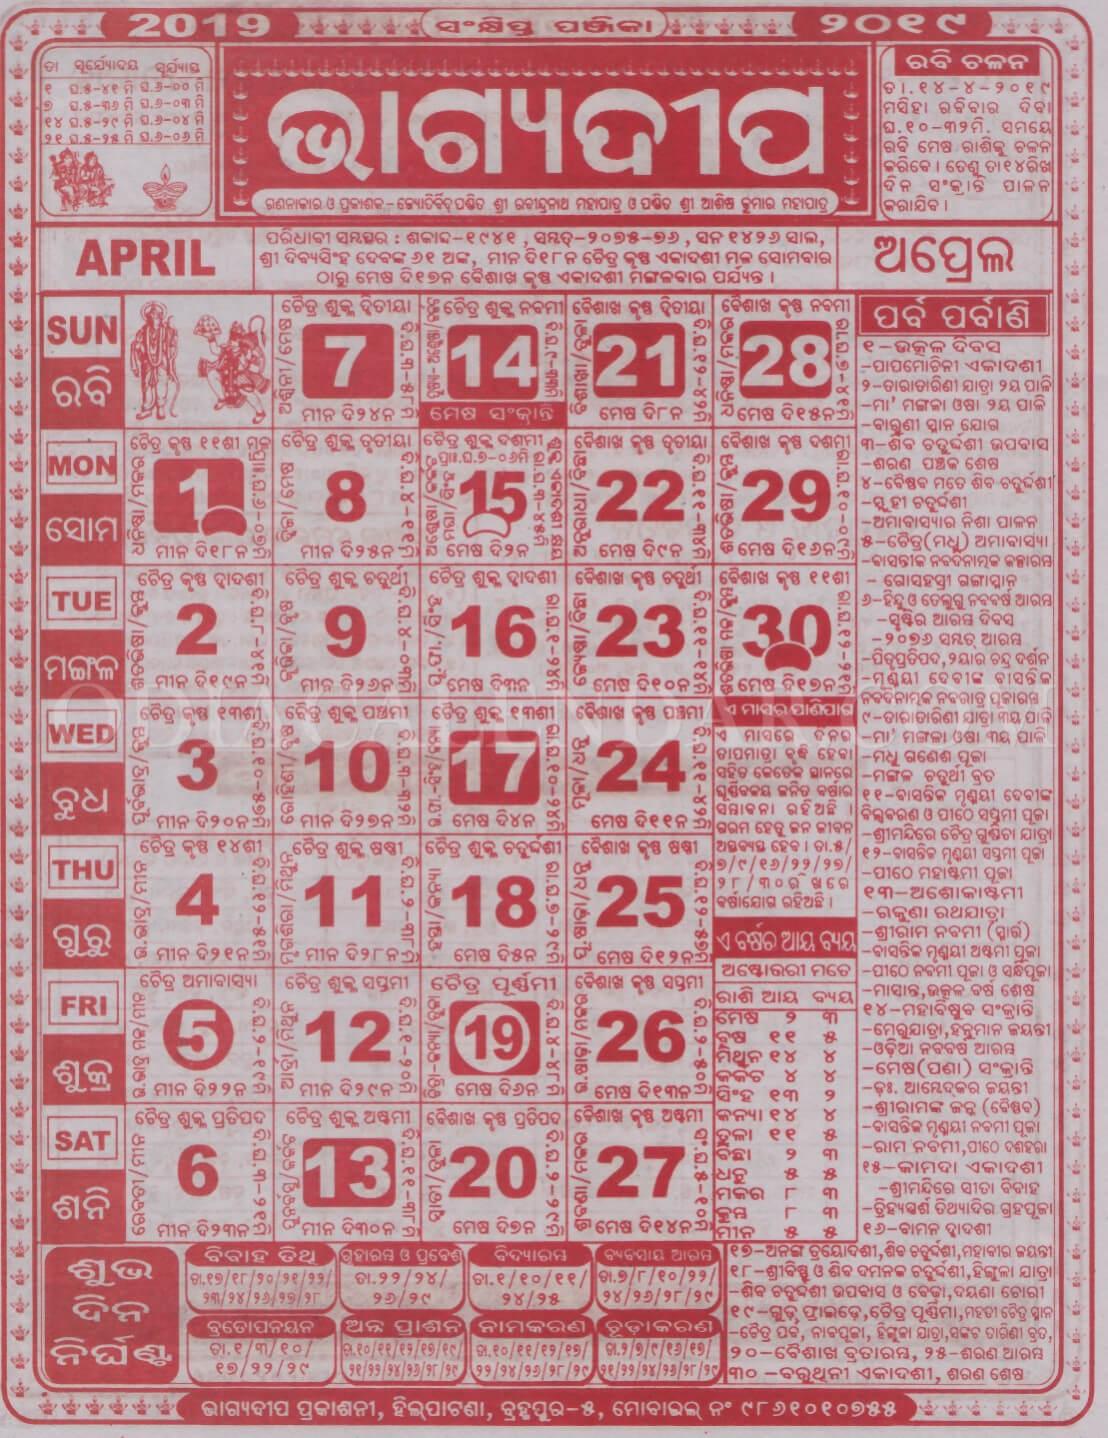 Odia Bhagyadeep Calendar 2020 April View And Download Free with regard to Bhagyadeep Odia Calendar 2020